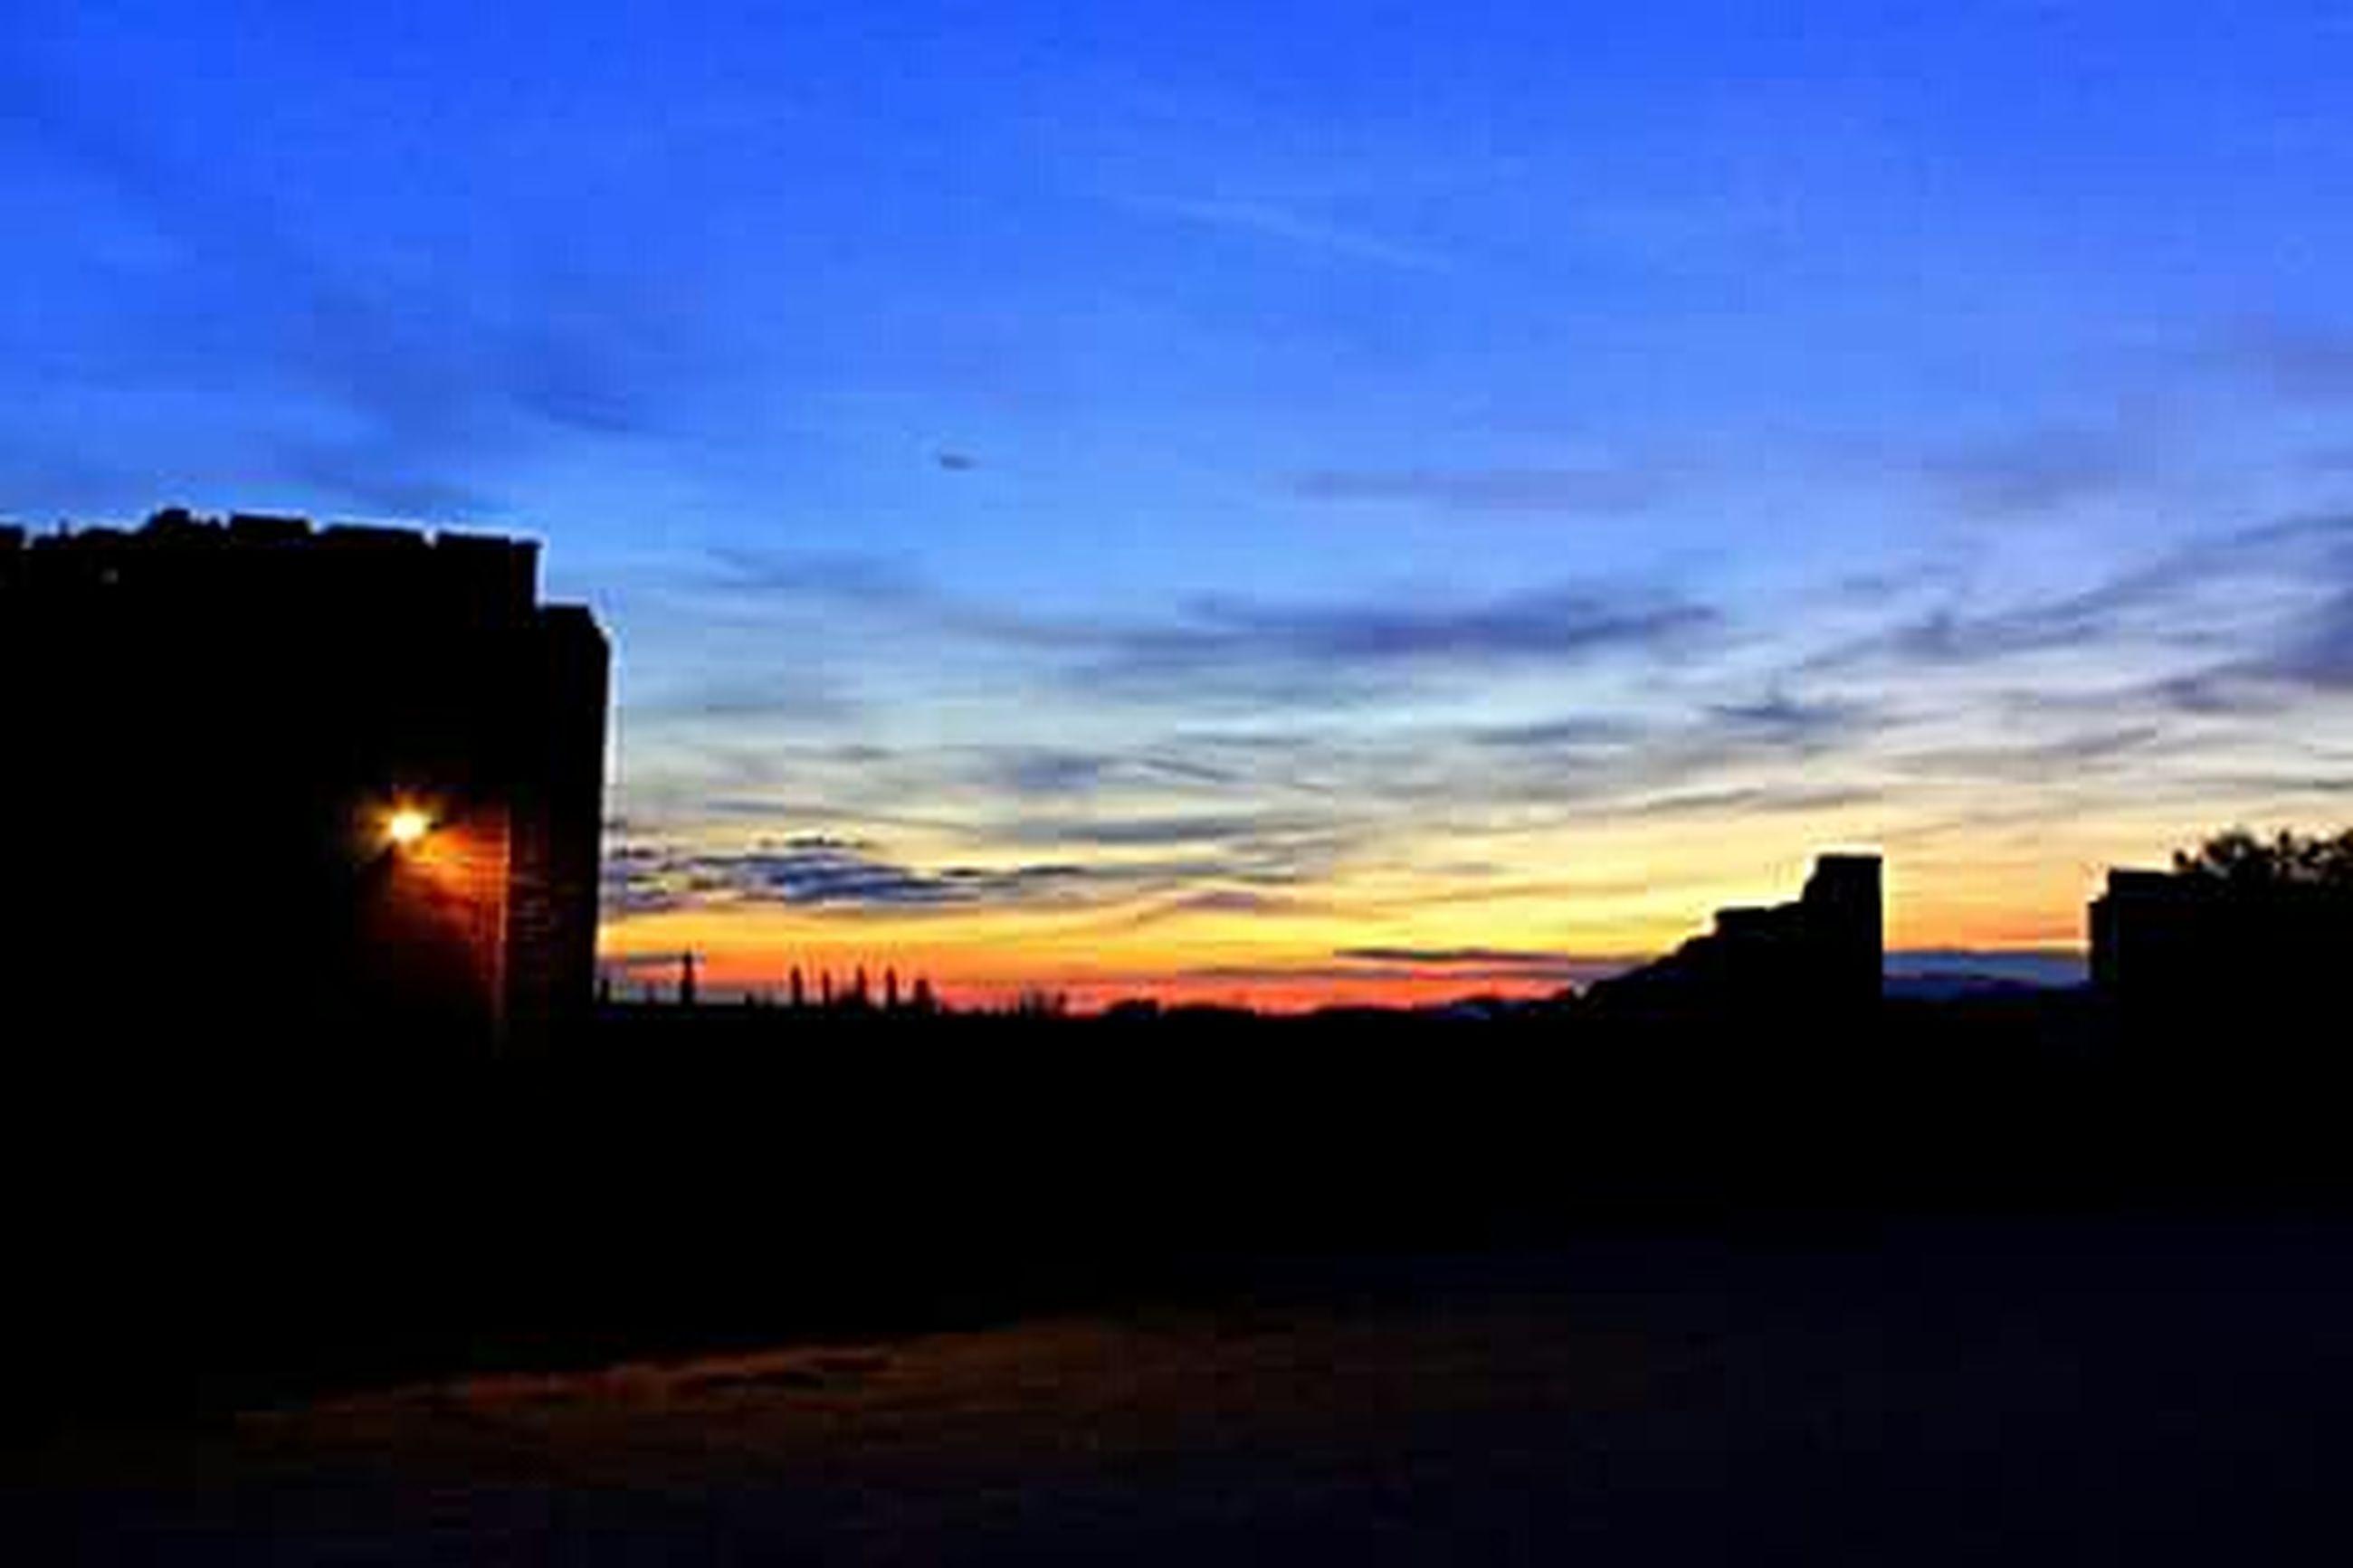 silhouette, sunset, sky, orange color, dark, scenics, beauty in nature, built structure, building exterior, tranquility, architecture, tranquil scene, cloud - sky, dramatic sky, outline, nature, copy space, cloud, dusk, idyllic